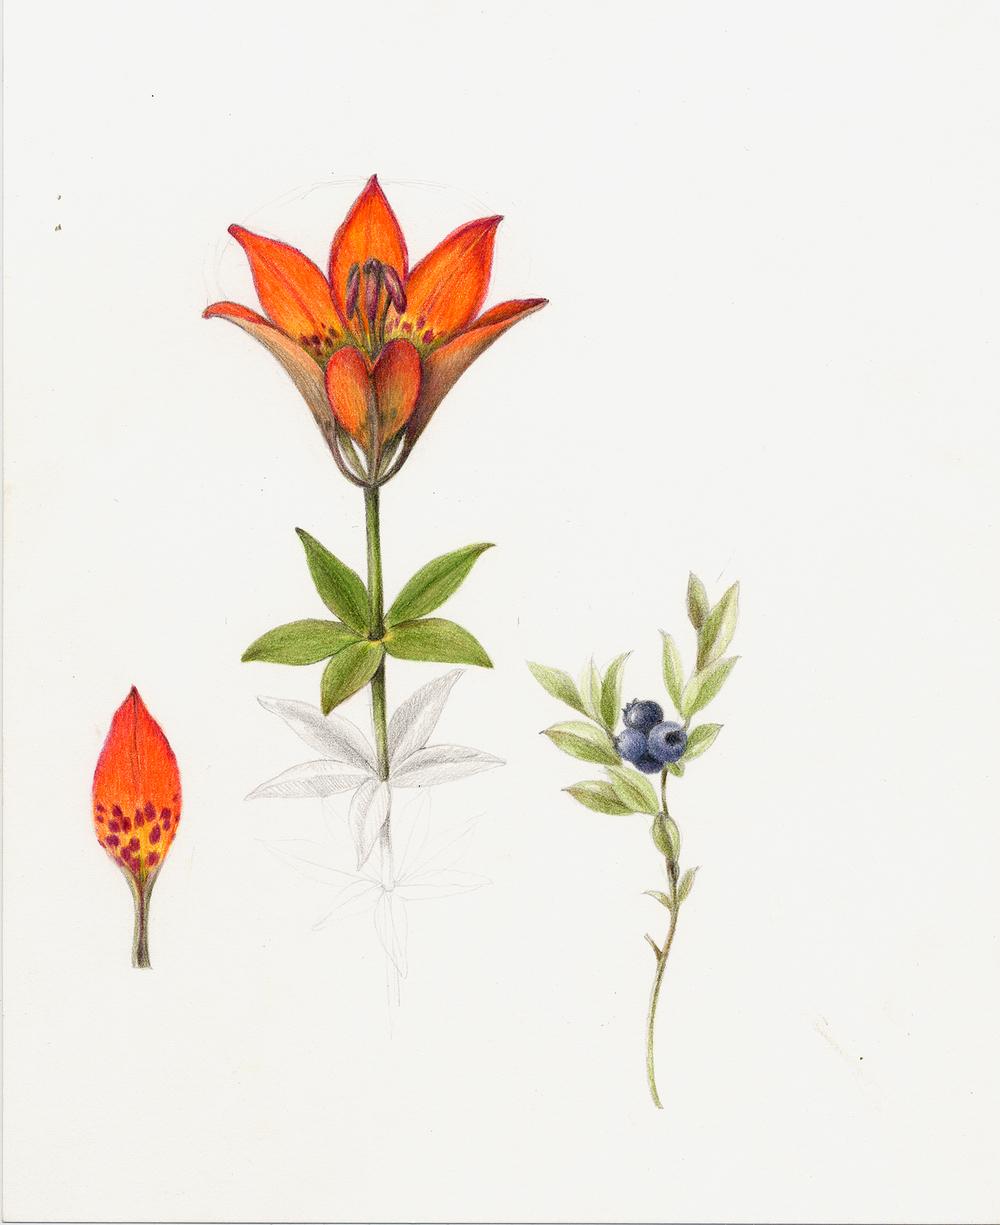 Wood Lily - Lilium philadelphicum